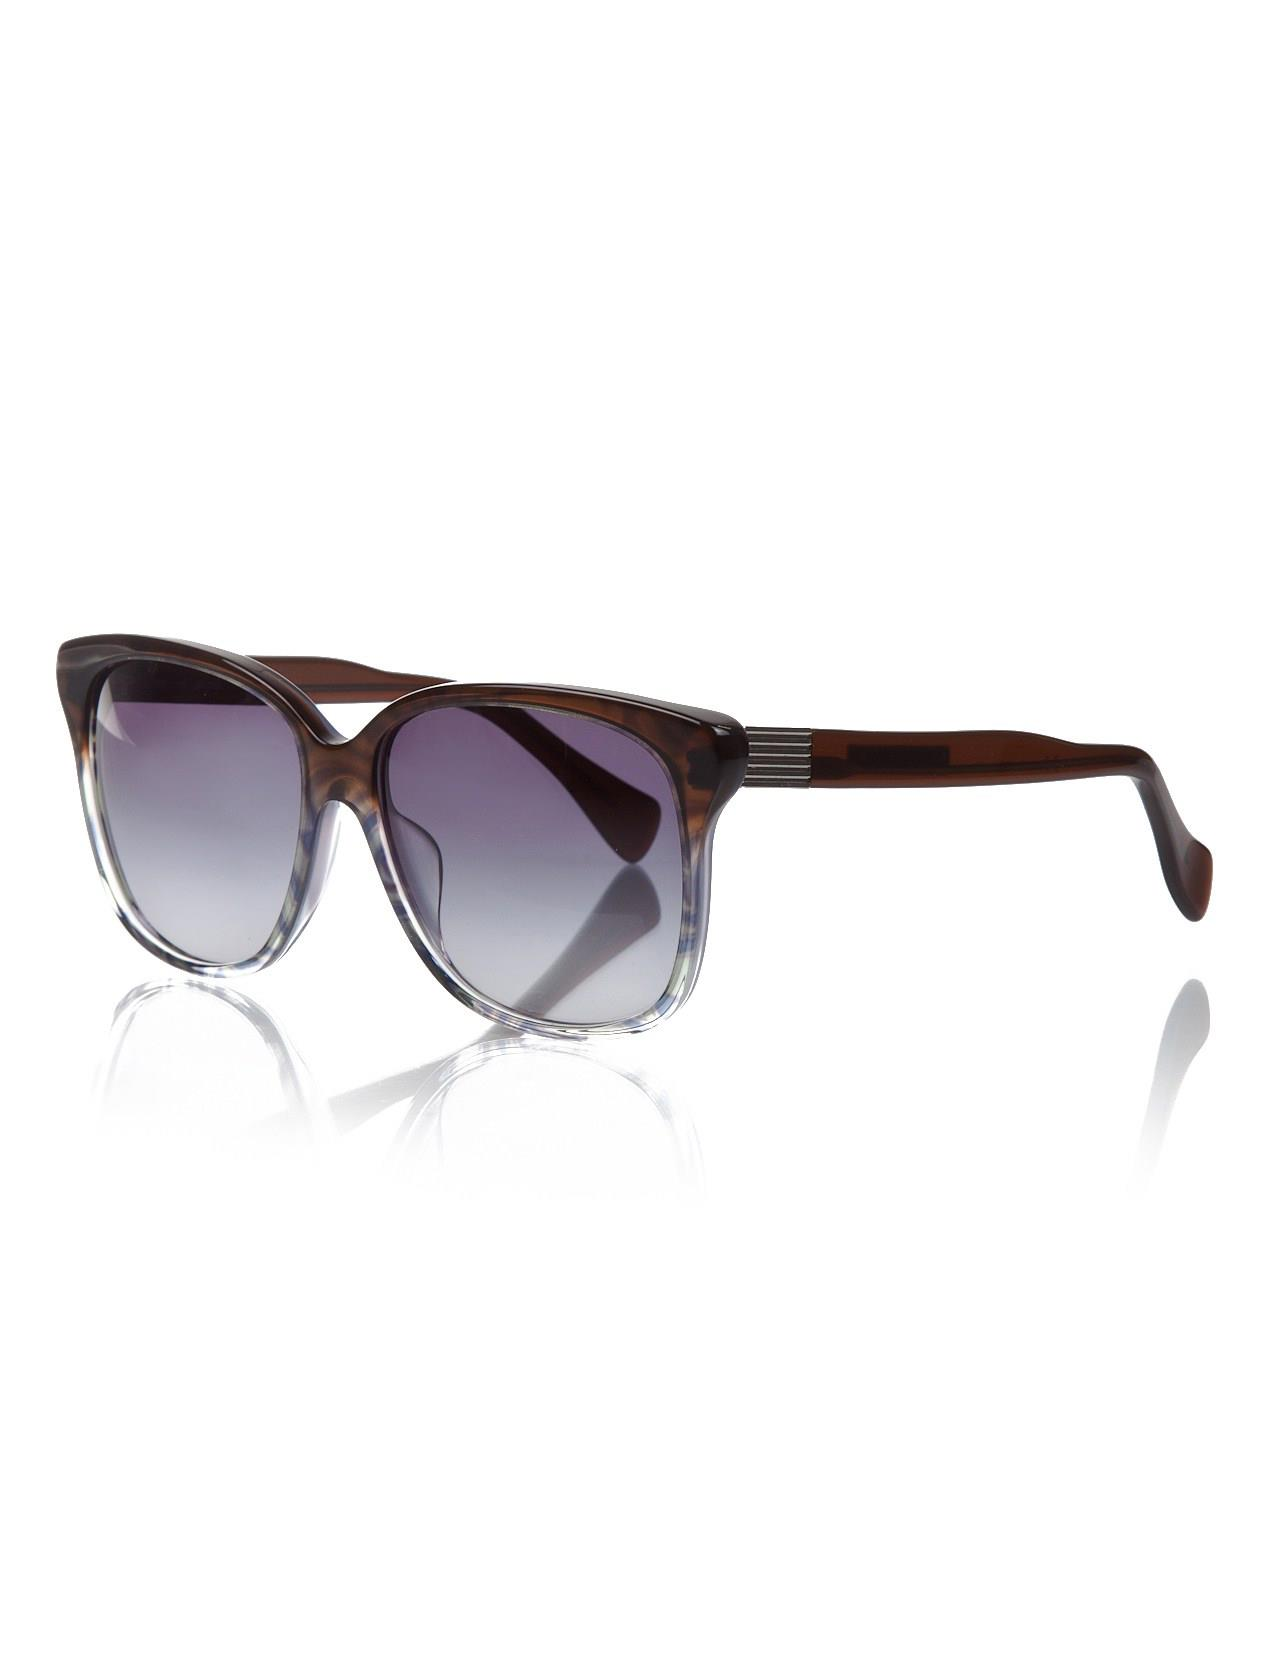 Women's sunglasses ep 728 491 bone color organic rectangle rectangular 56-16-135 emilio pucci